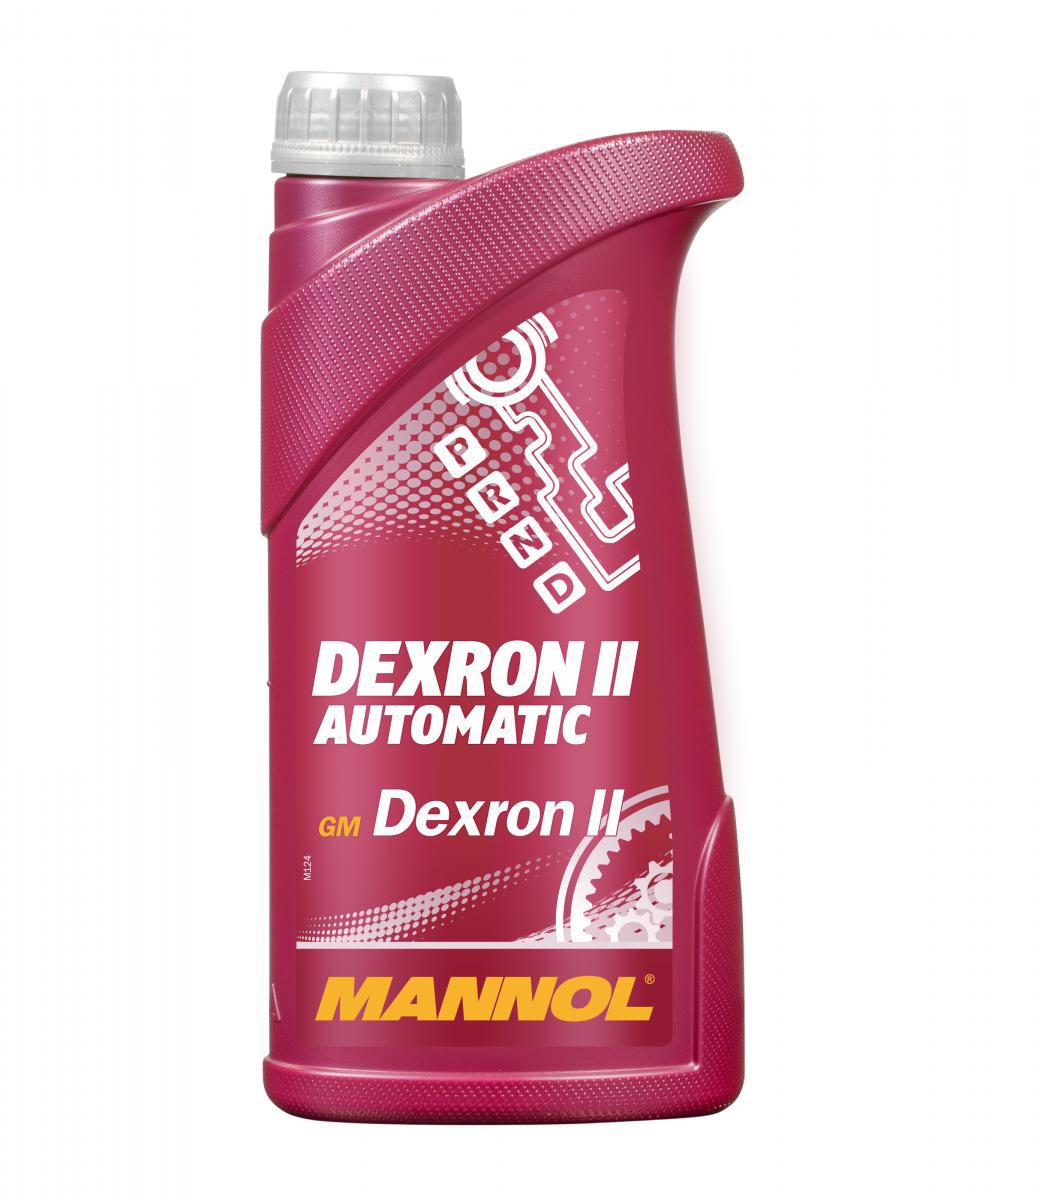 Dexron II Automatic